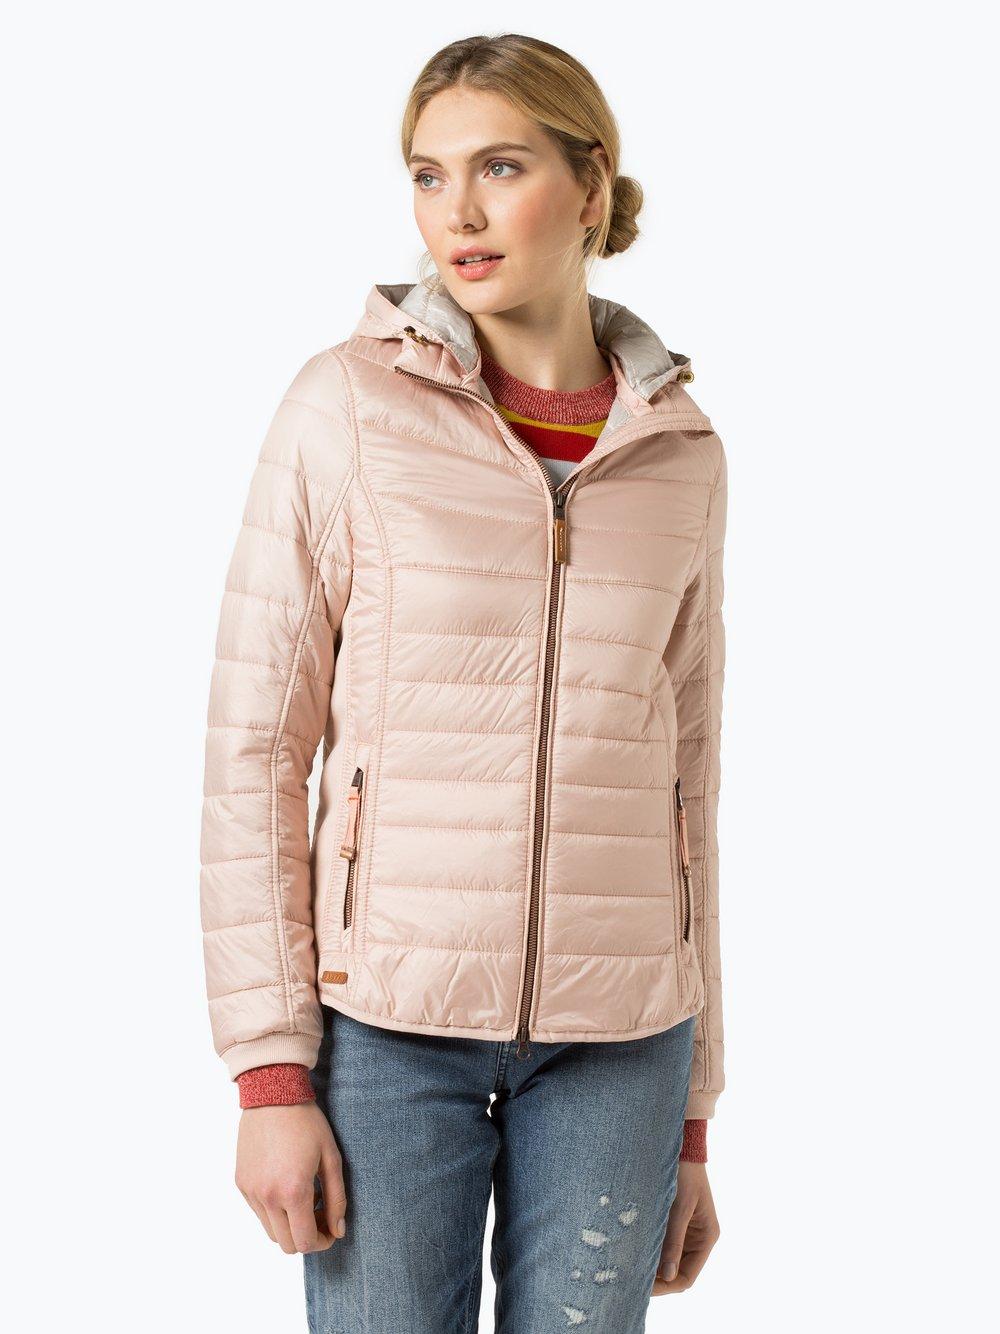 Camel Active – Damska kurtka pikowana, różowy Van Graaf 415743-0001-00440